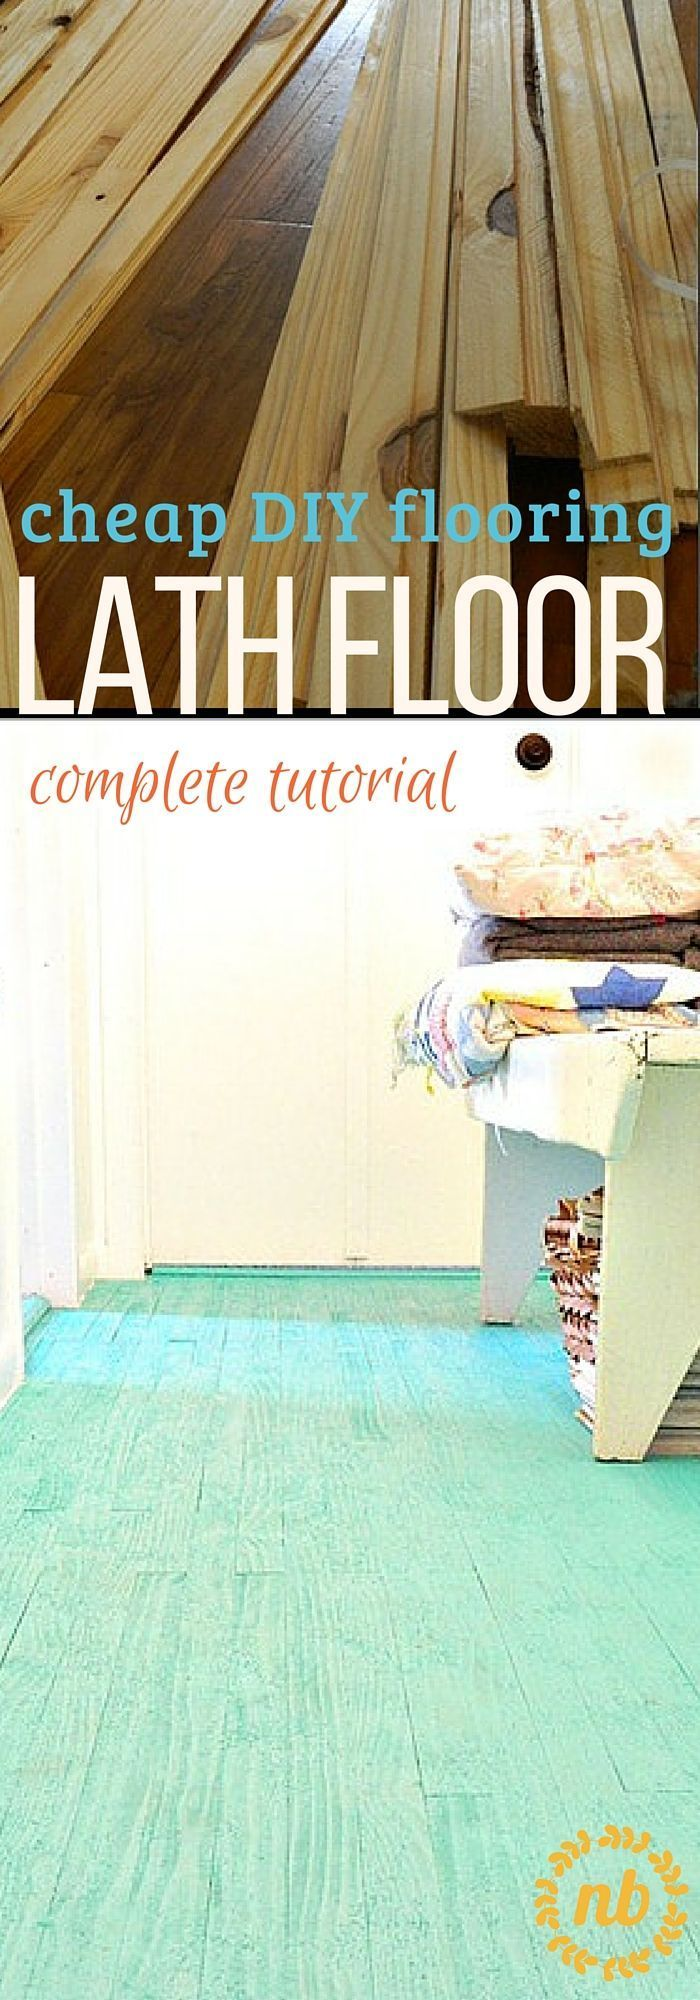 Cheap flooring idea: lath floor tutorial   DIY & Self Sufficiency ...